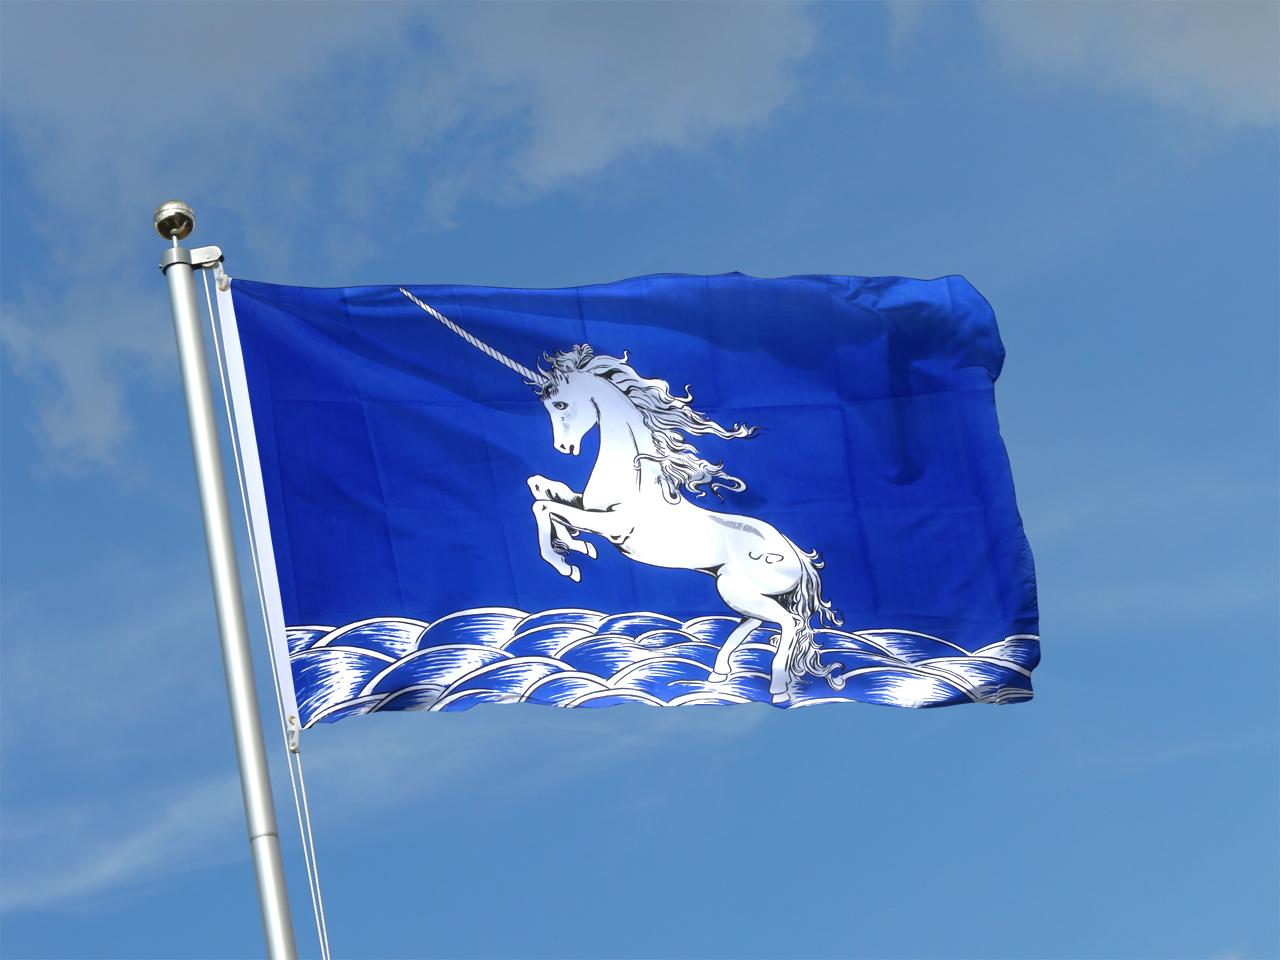 Buy Unicorn blue Flag - 3x5 ft (90x150 cm) - Royal-Flags